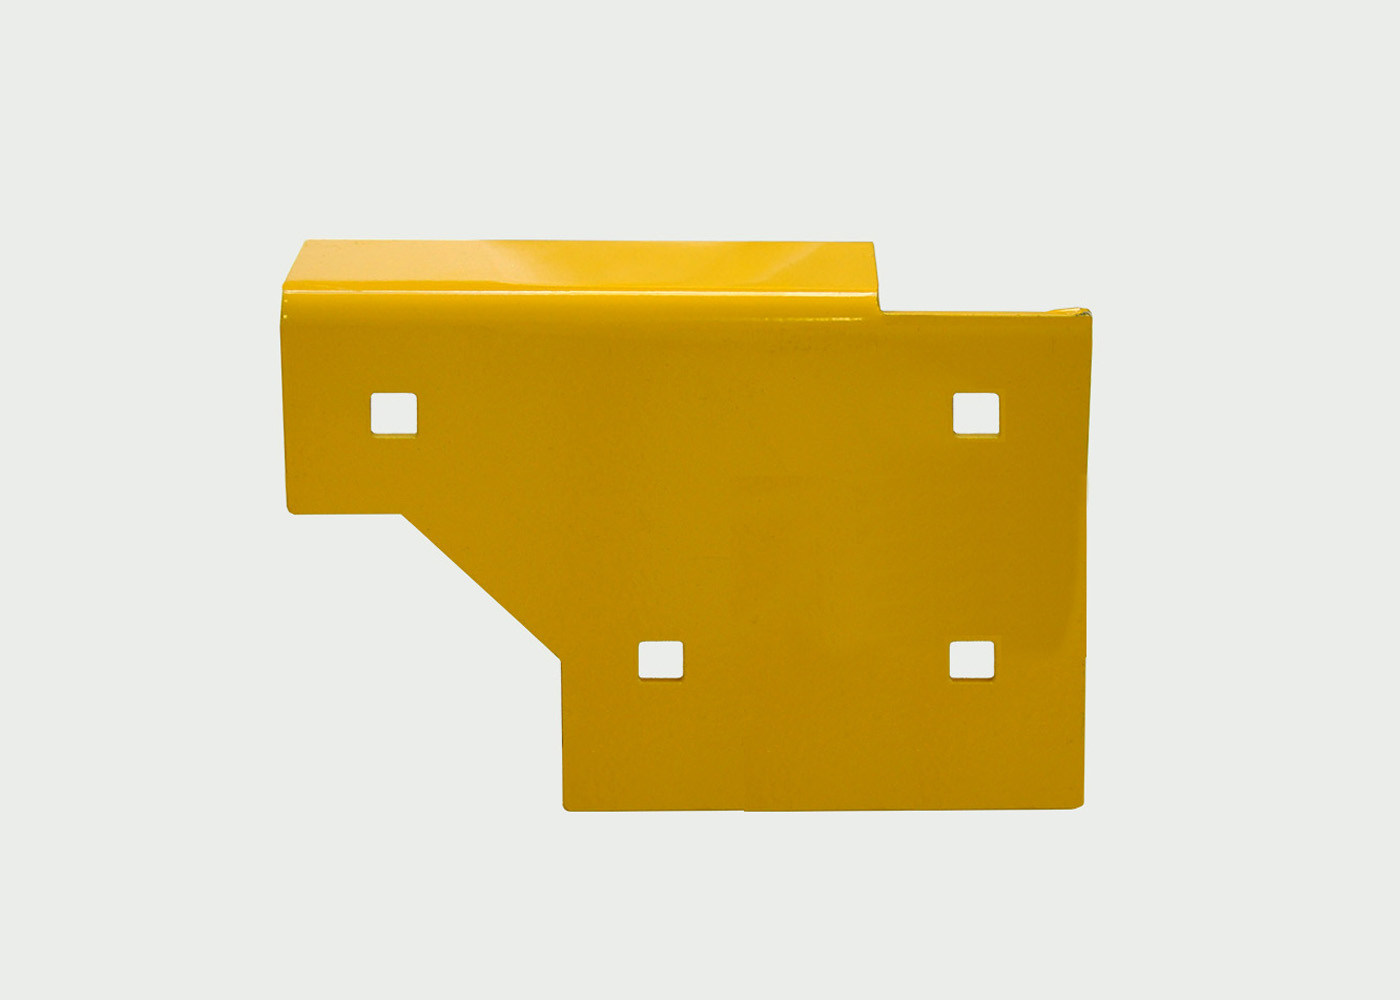 A12817-lh-special-panel-bracket-1400w